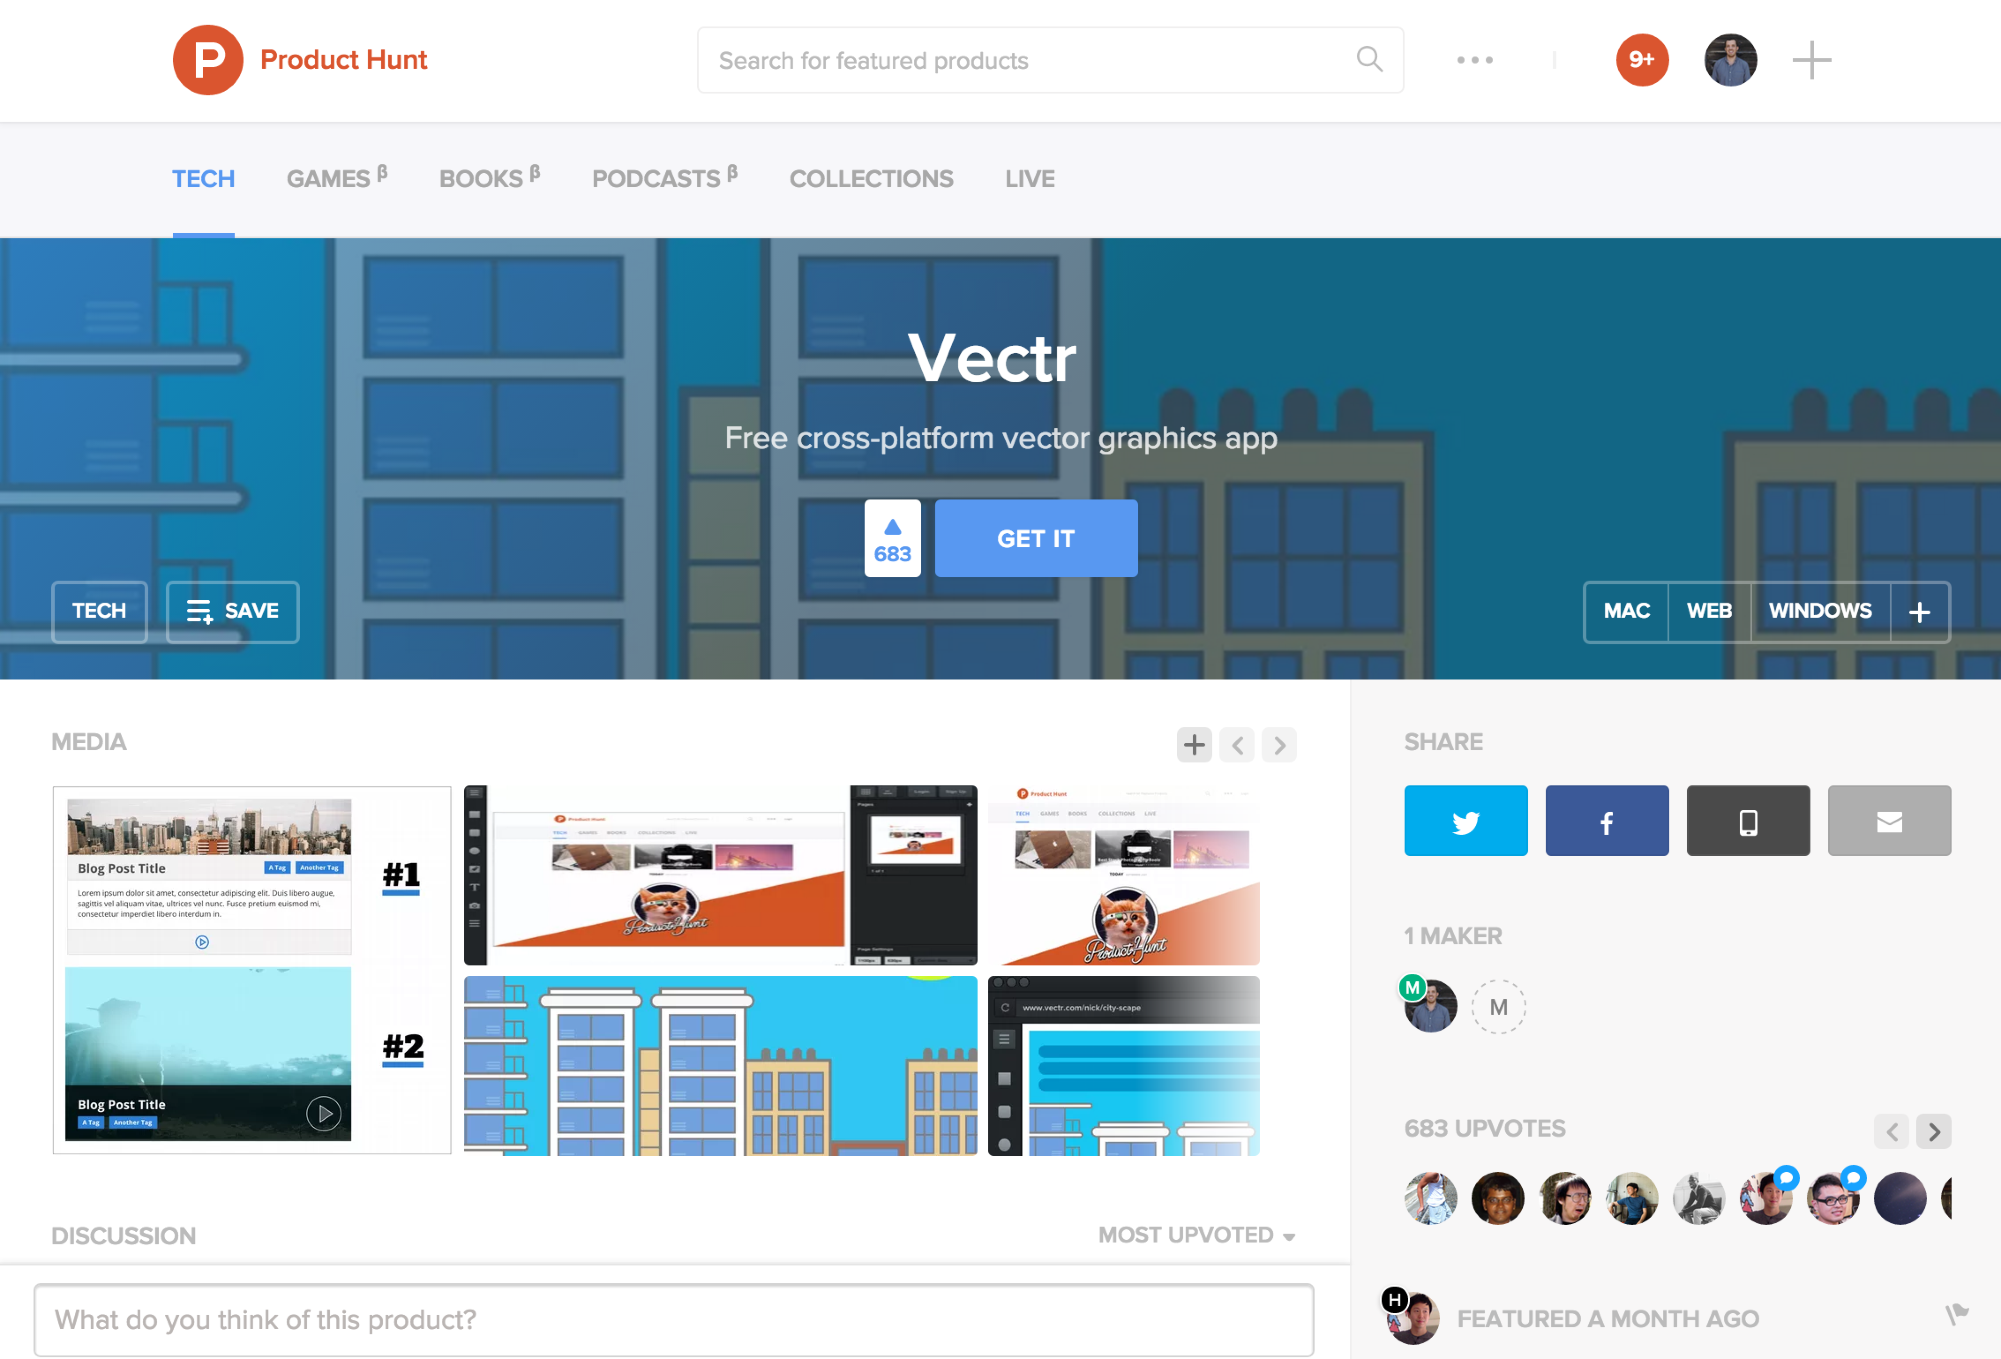 Vectr Product Hunt